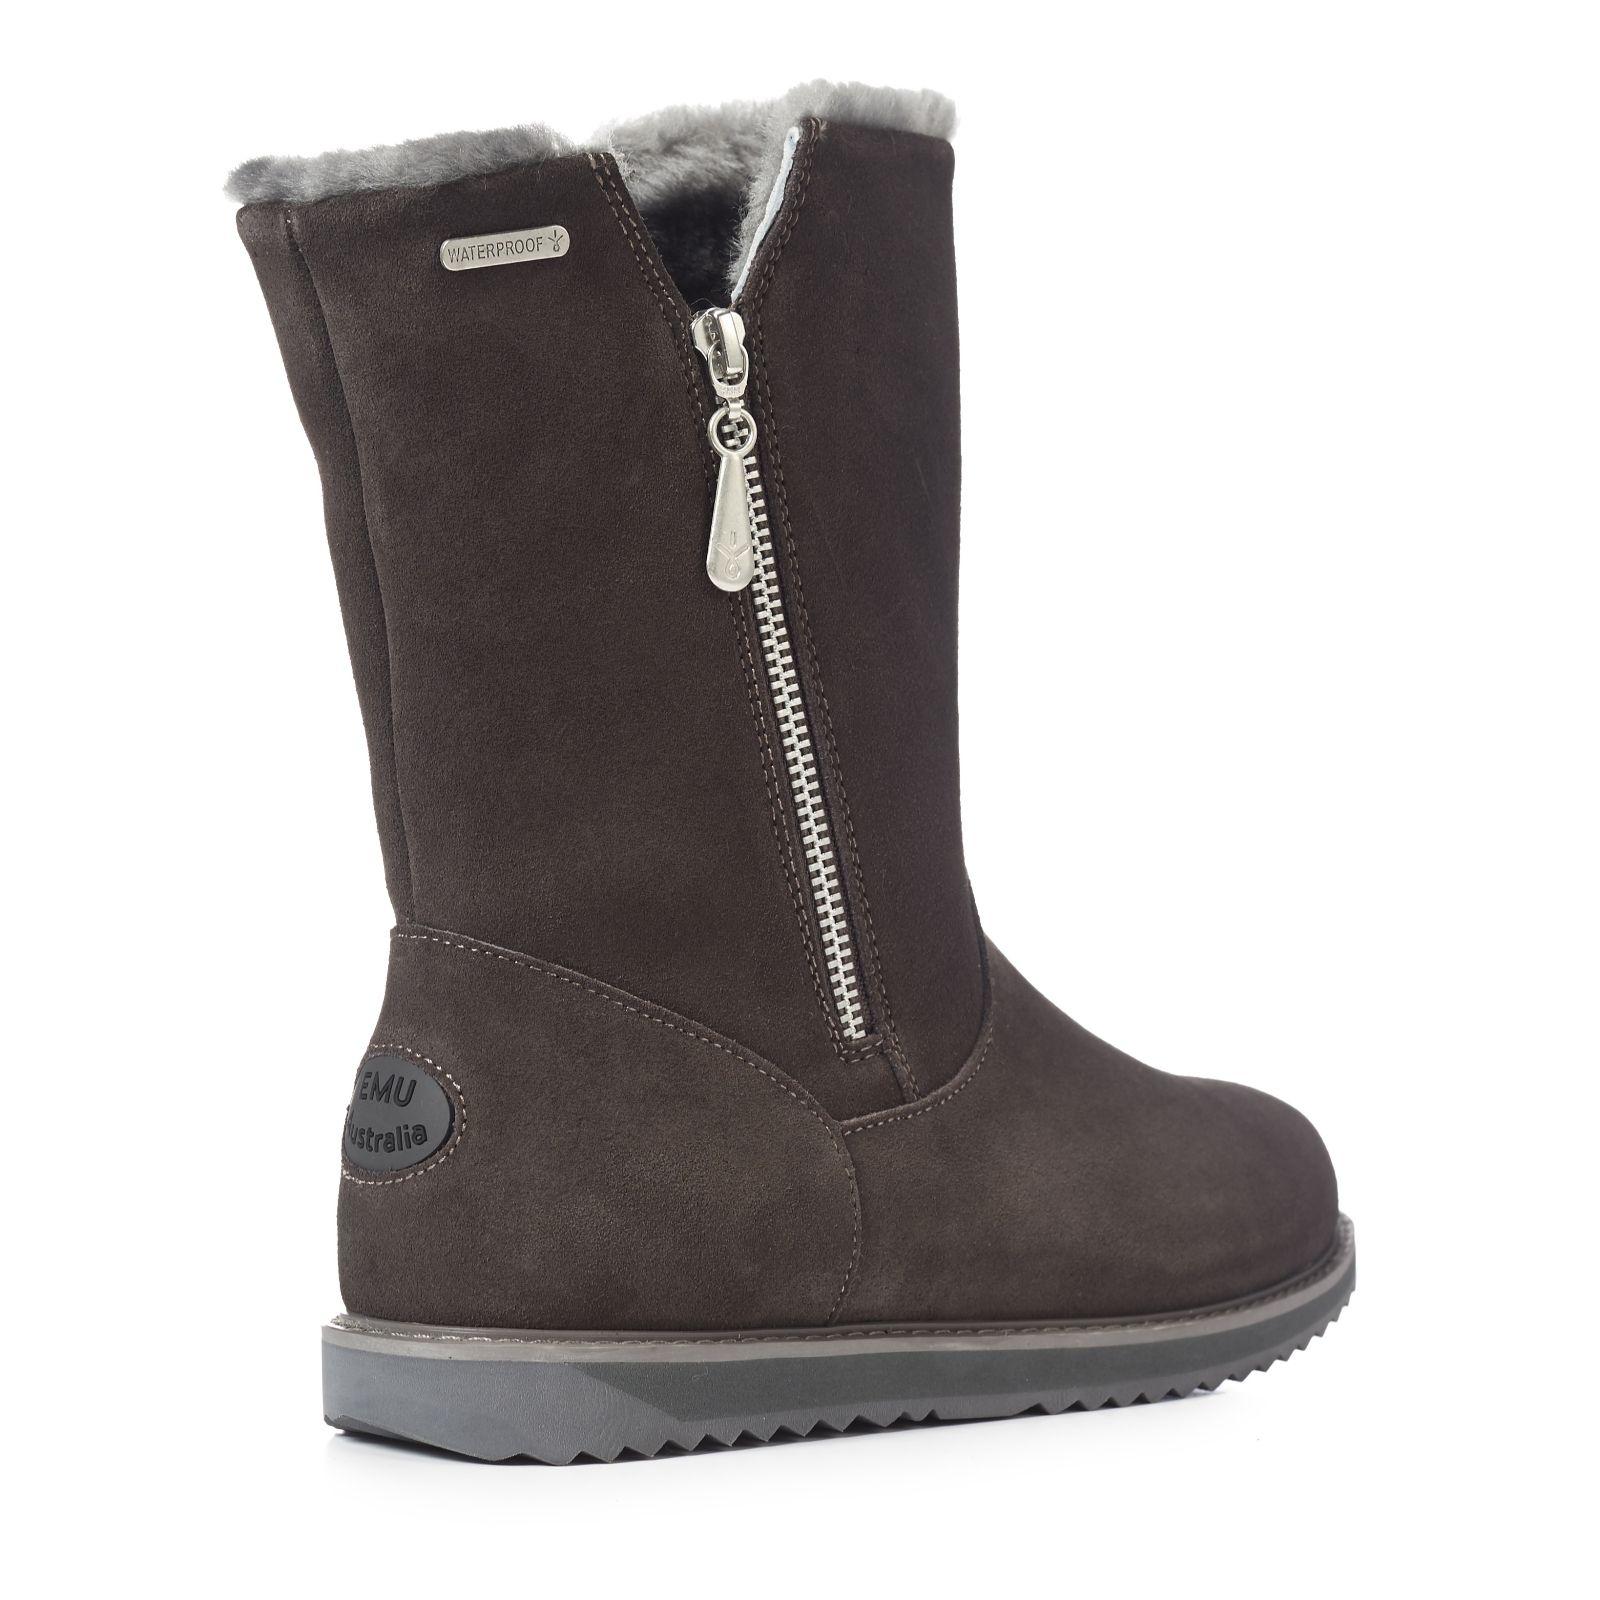 6924ac5147c Emu All Weather Gravelly Waterproof Sheepskin Boot - QVC UK